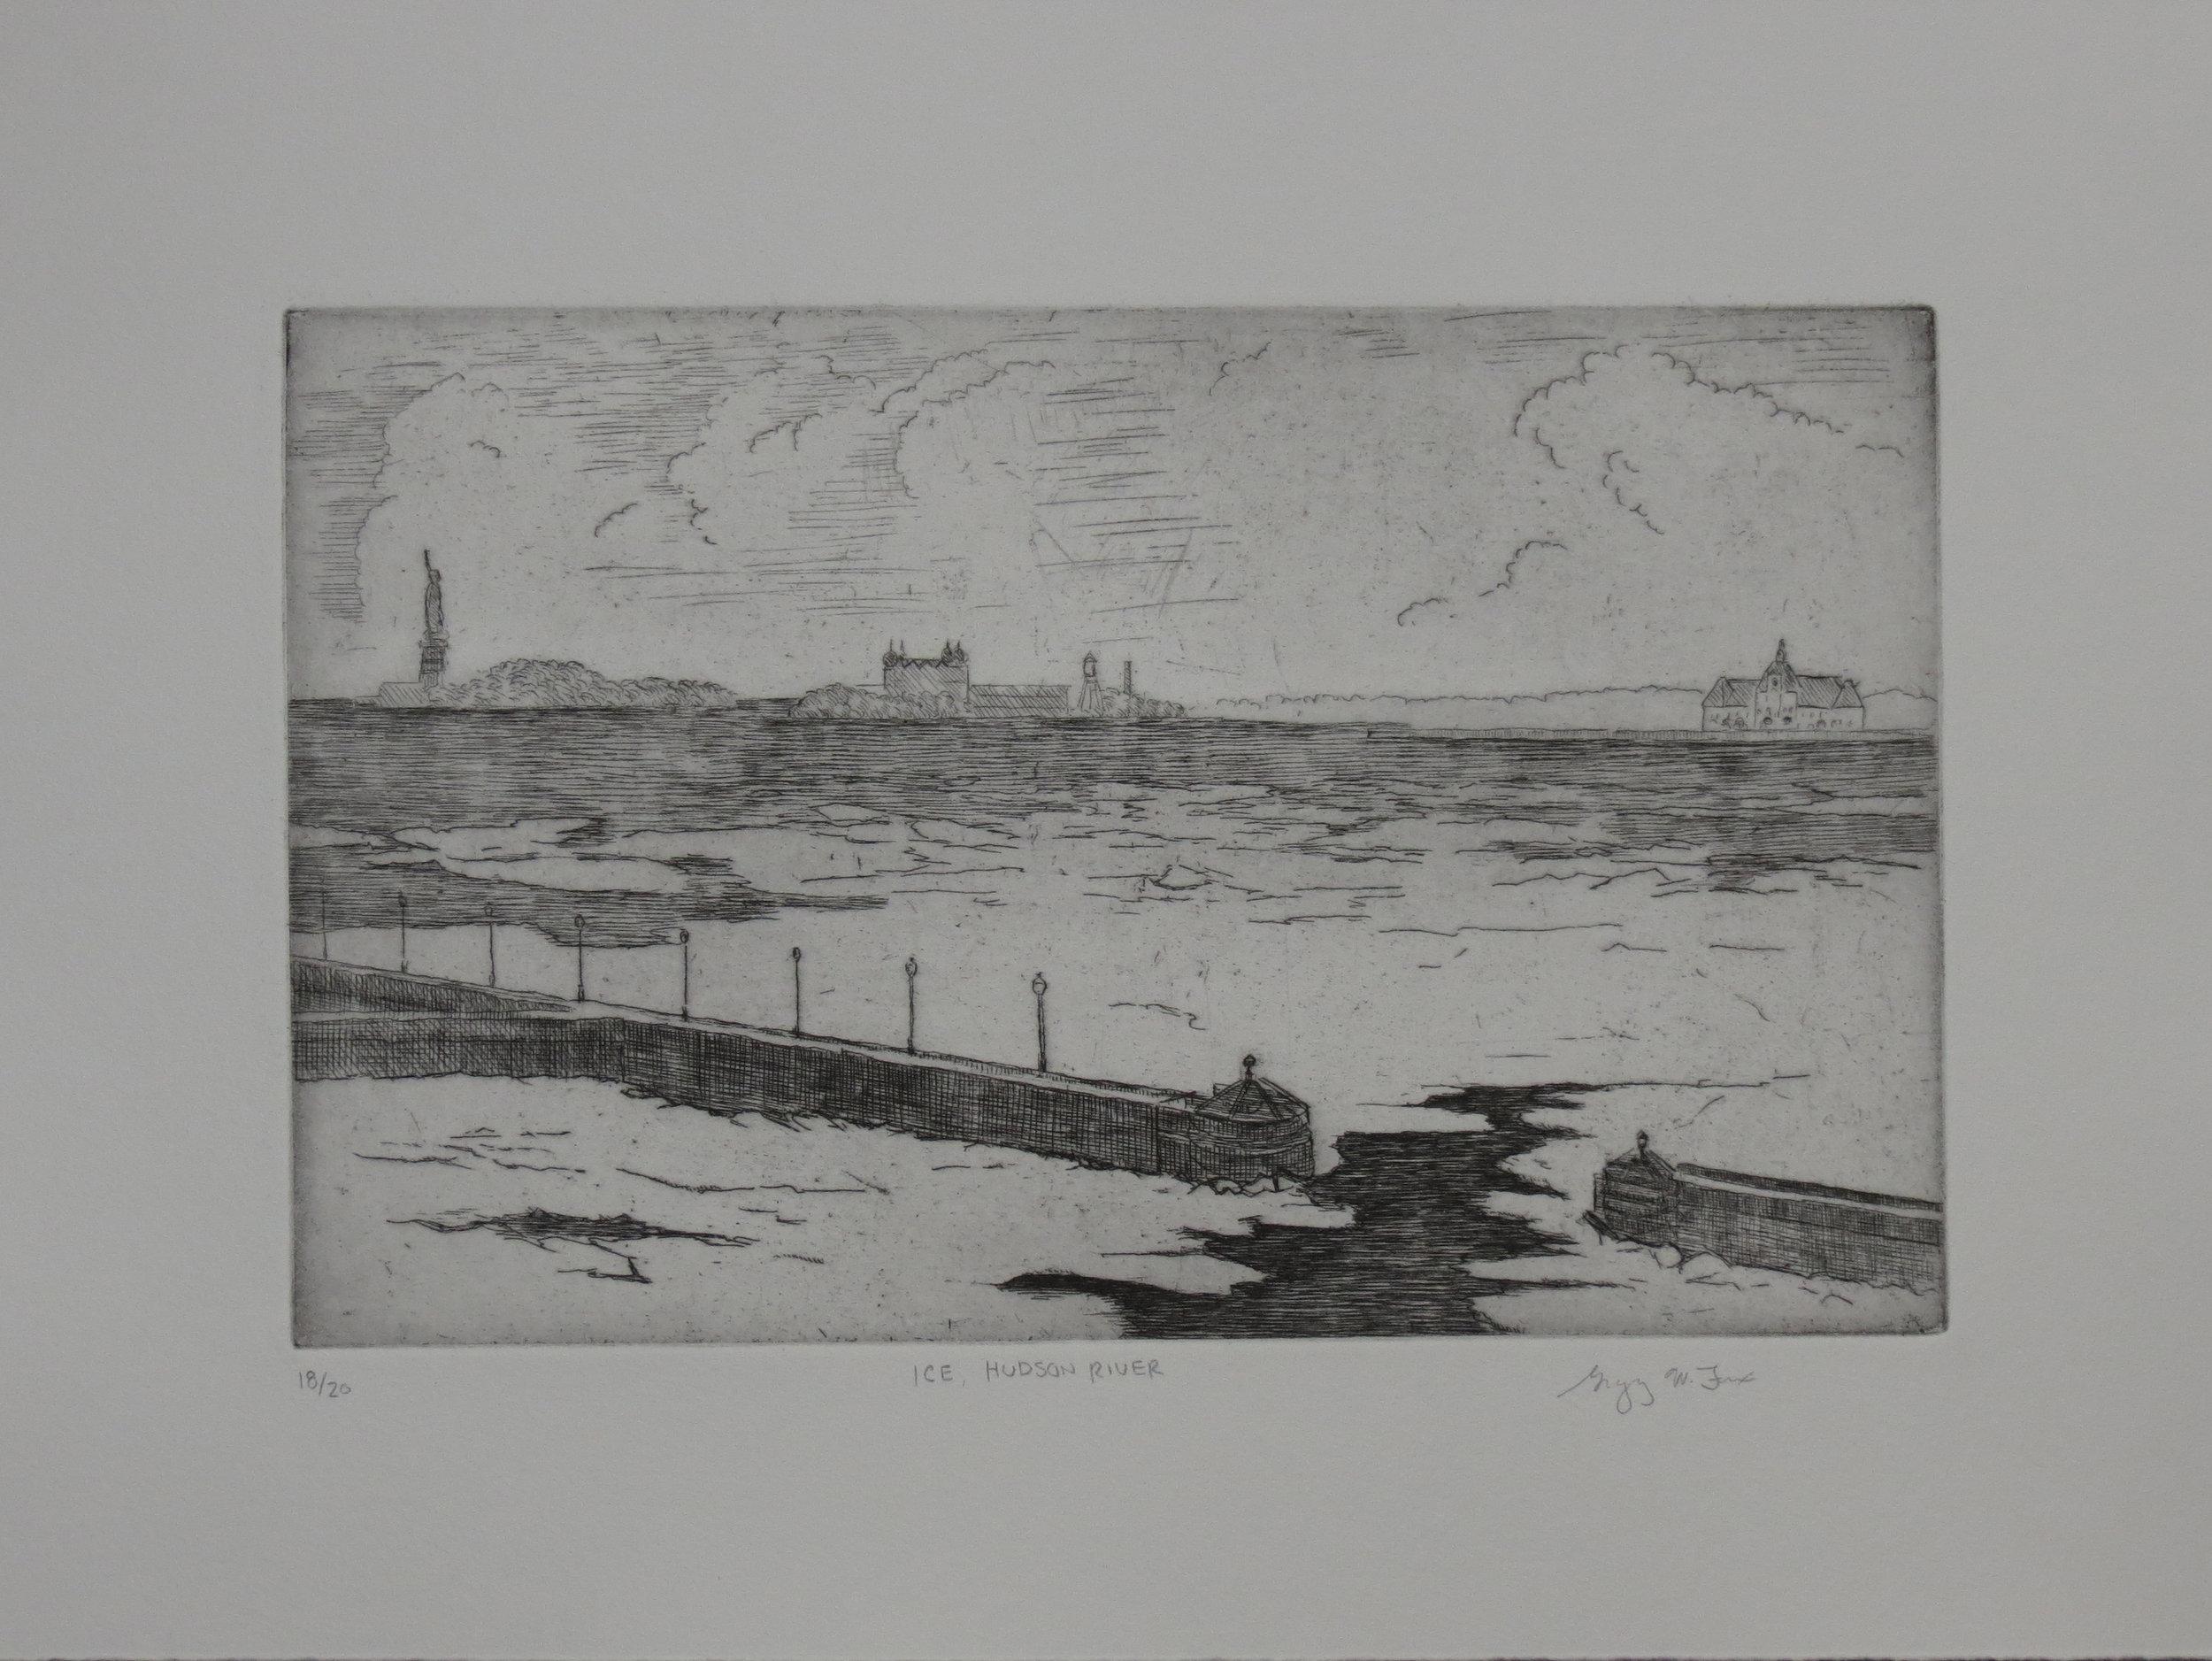 Ice, Hudson River